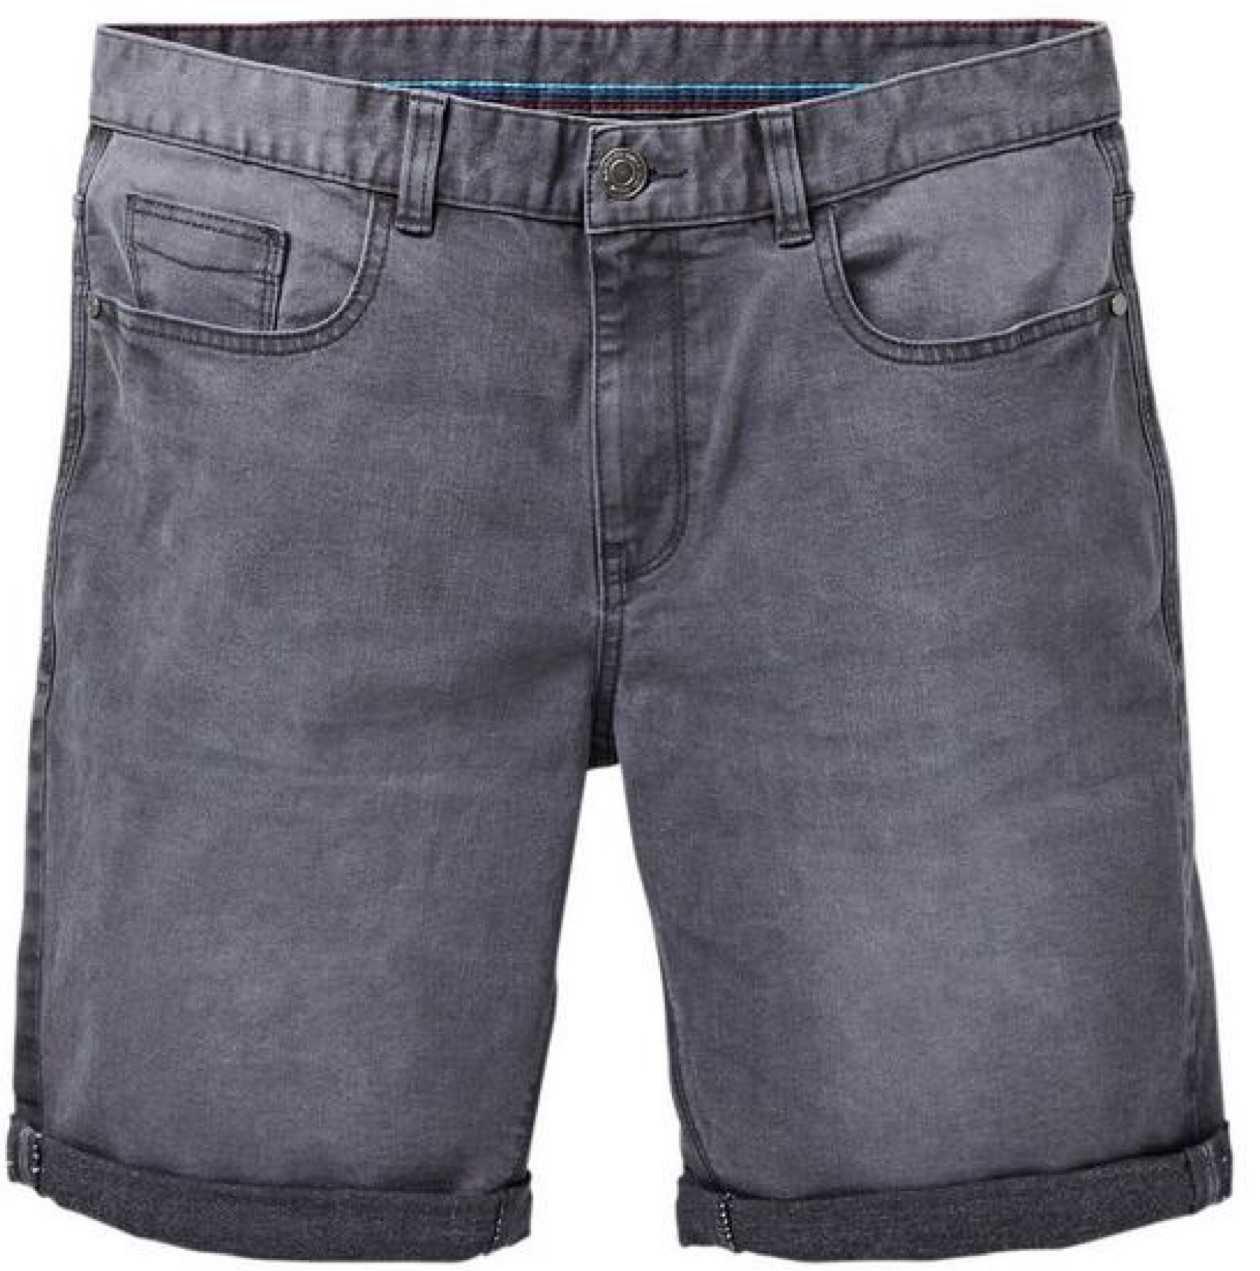 grey jean shorts